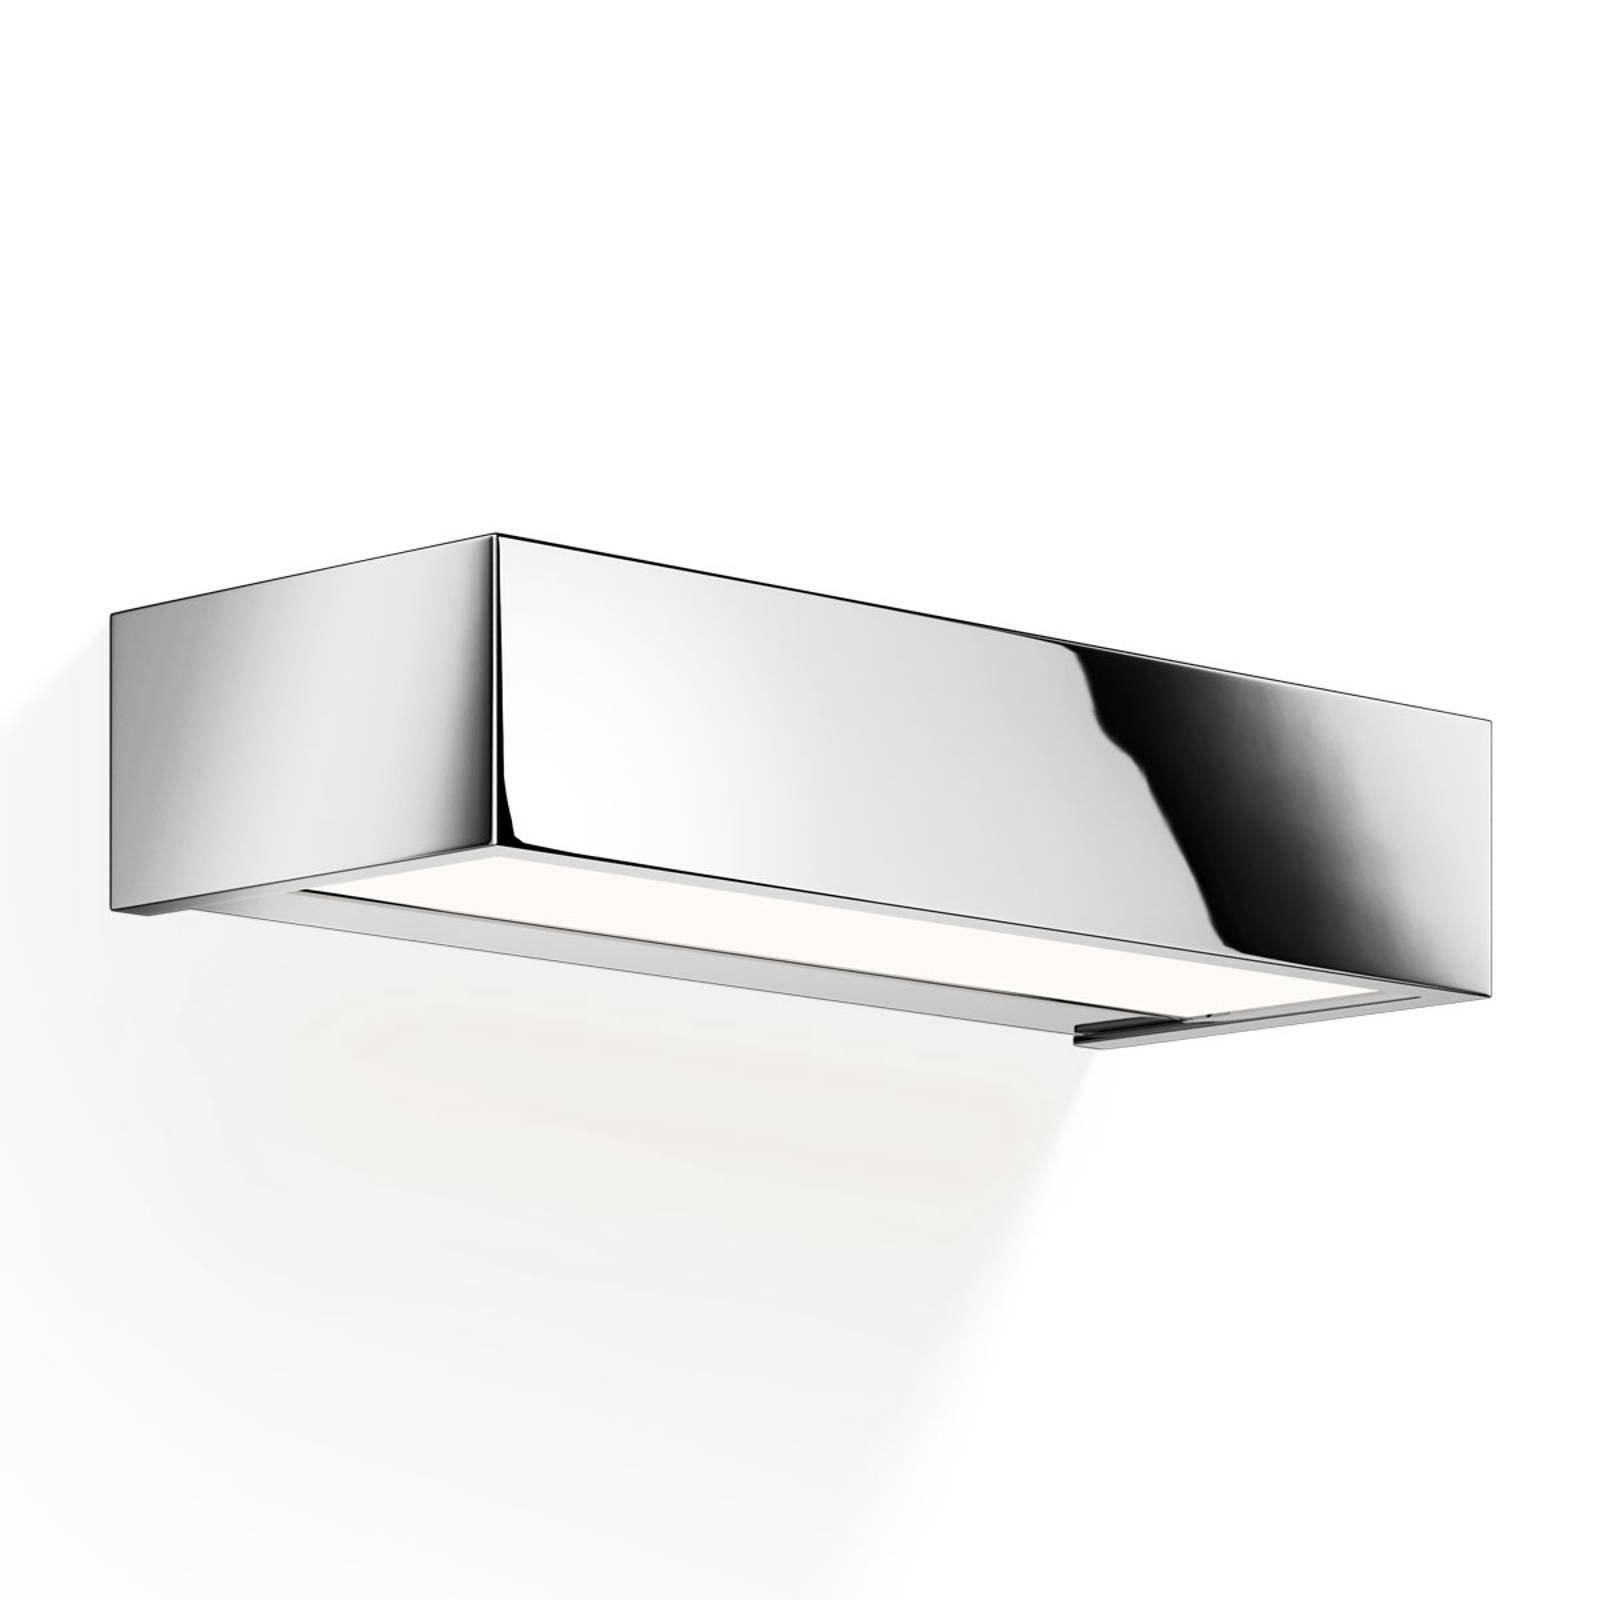 Decor Walther Box 25 N LED-vegglampe 2 700 K